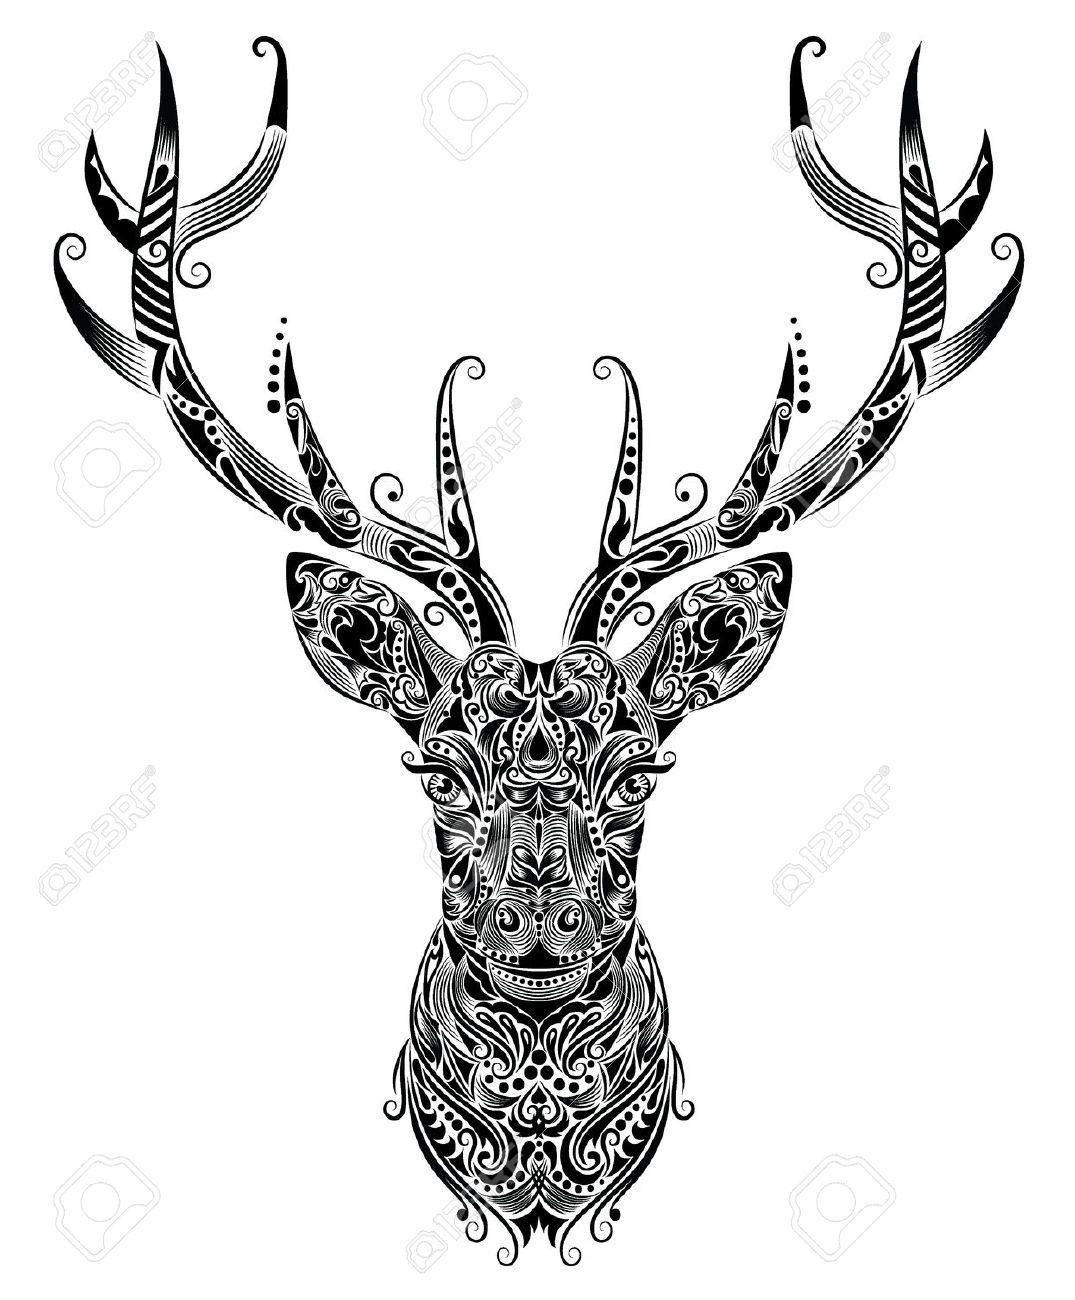 1075x1300 Collection Of Free Elke Clipart Elk Skull Download On Ui Ex